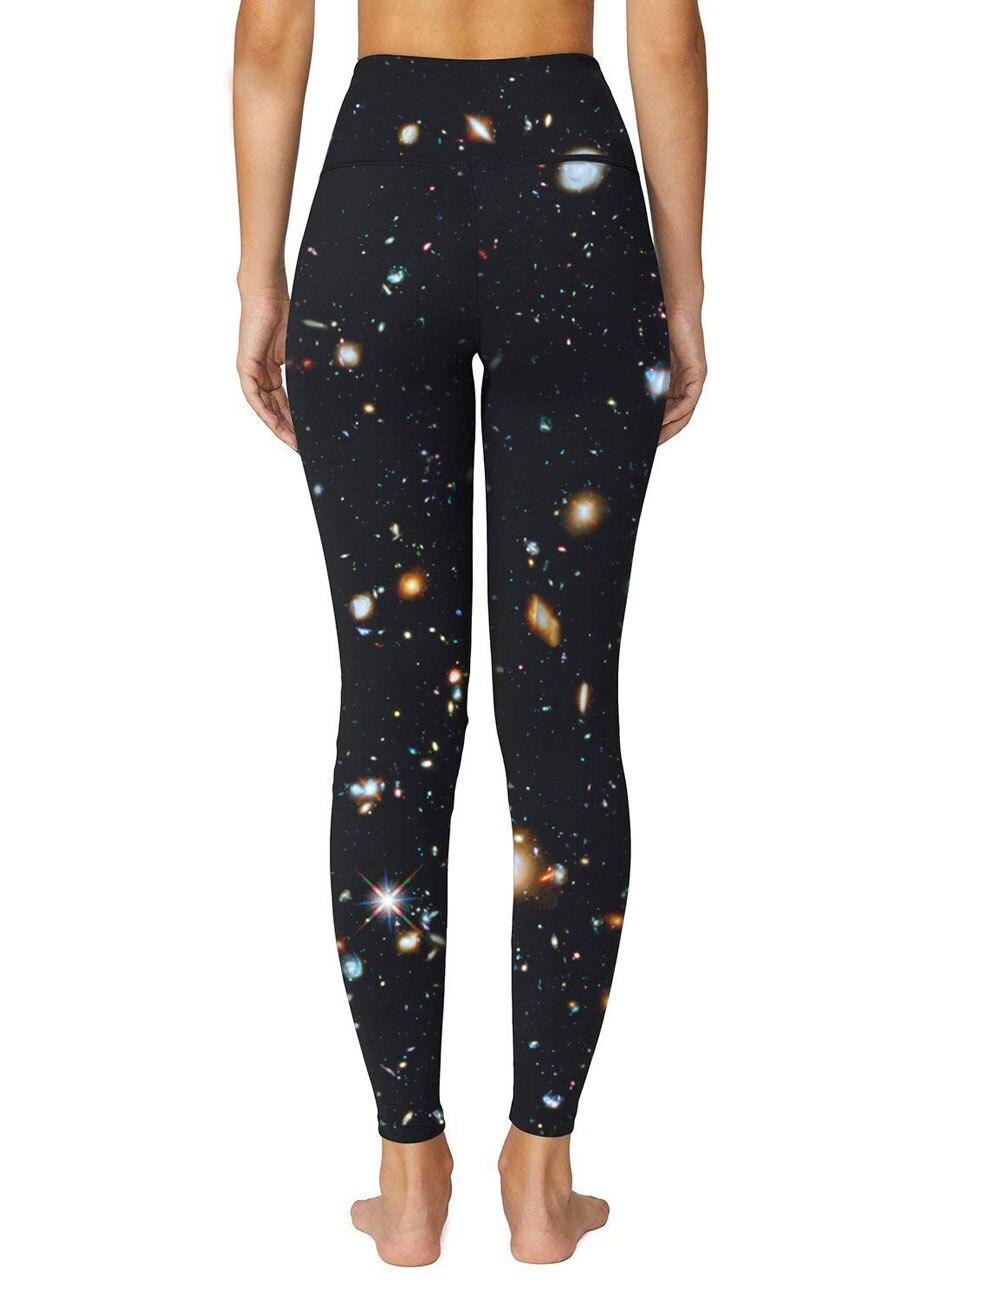 High Quality Universe Galaxies Women's Digital Printed Yoga Capris High Waist Workout Pants Moisture Wicking Running Leggings 2